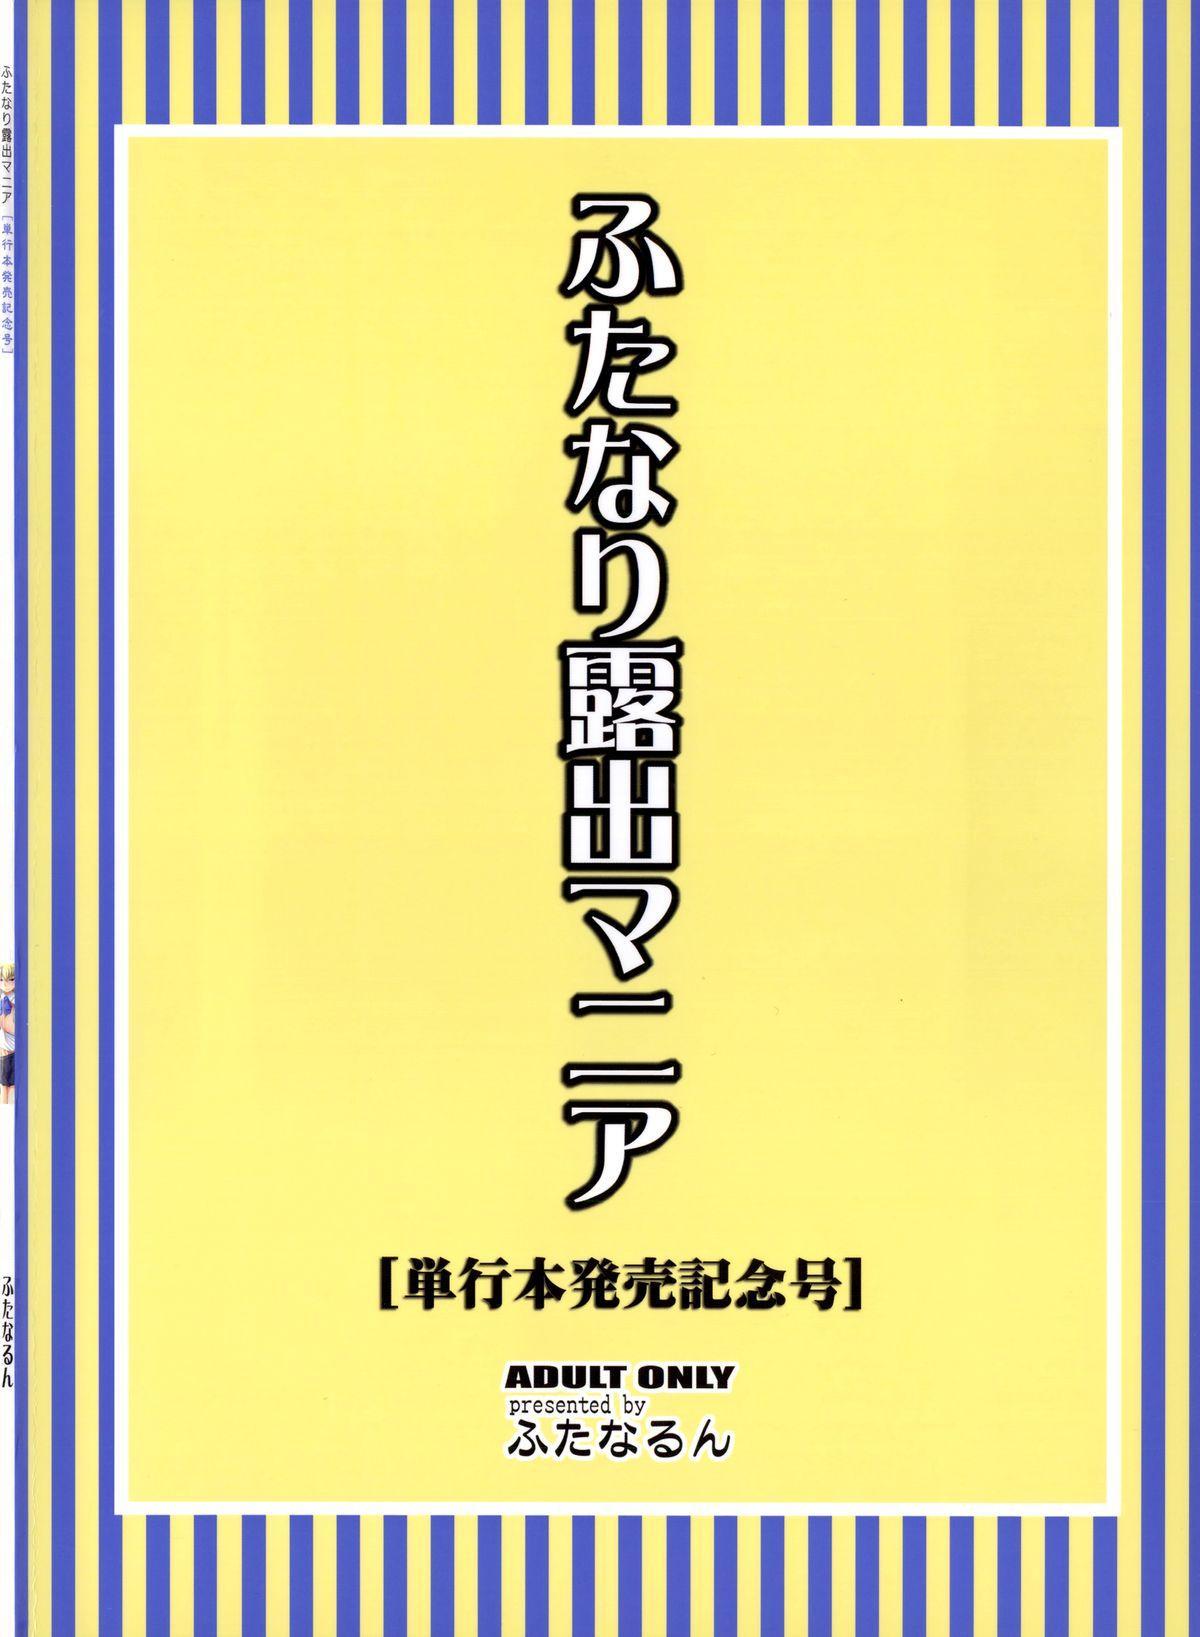 [Futanarun (Kurenai Yuuji)] Futanari Roshutsu Mania [Tankoubon Hatsubai Kinen Gou] | [Full Volume Commemorative Edition] [English] =SW= 25